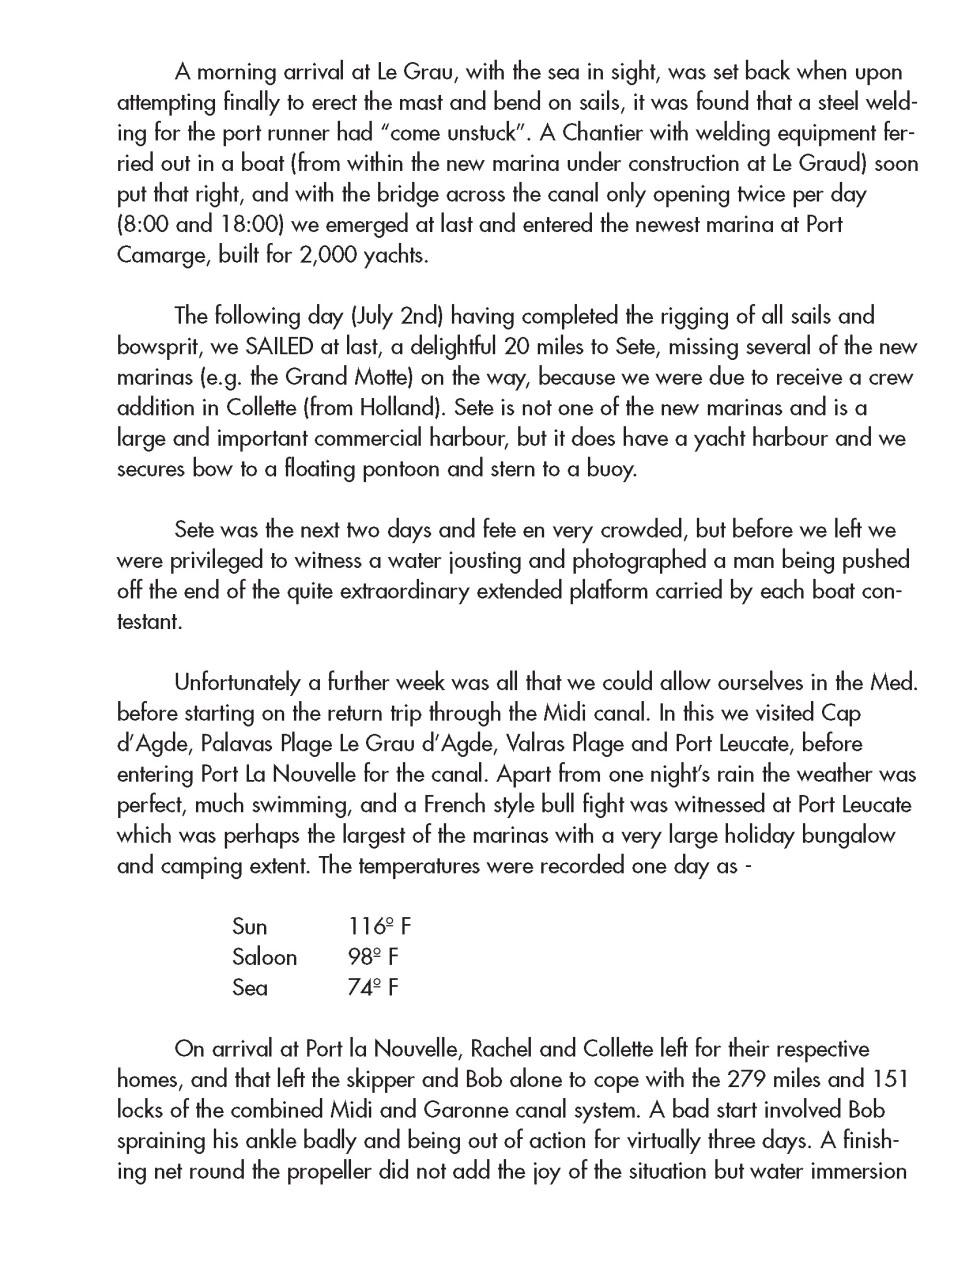 Narrative1971_Page_11